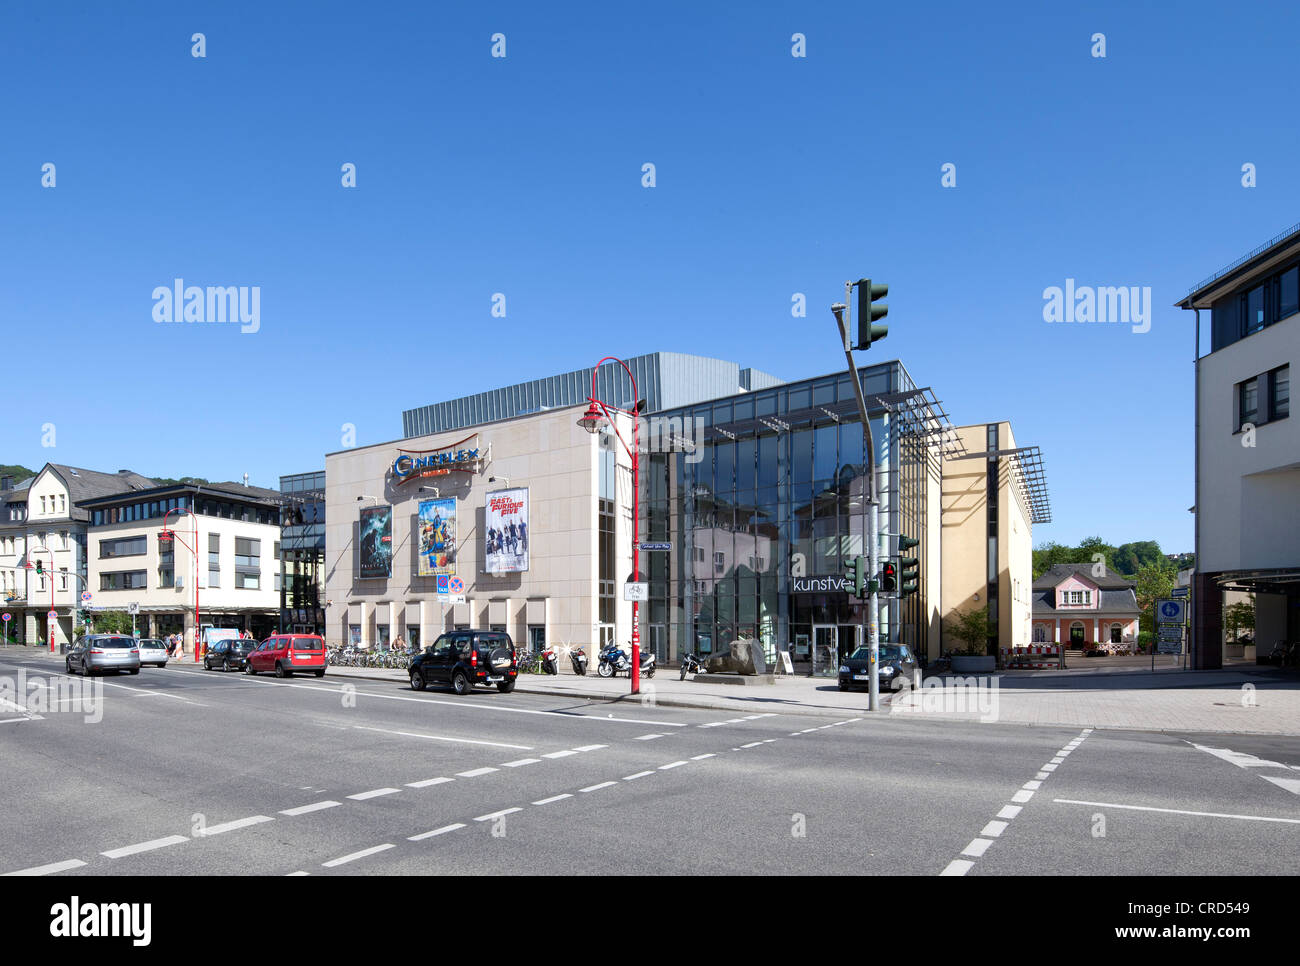 Marburger Kunstverein art society, Cineplex Cinema, Marburg, Hesse, Germany, Europe, PublicGround - Stock Image